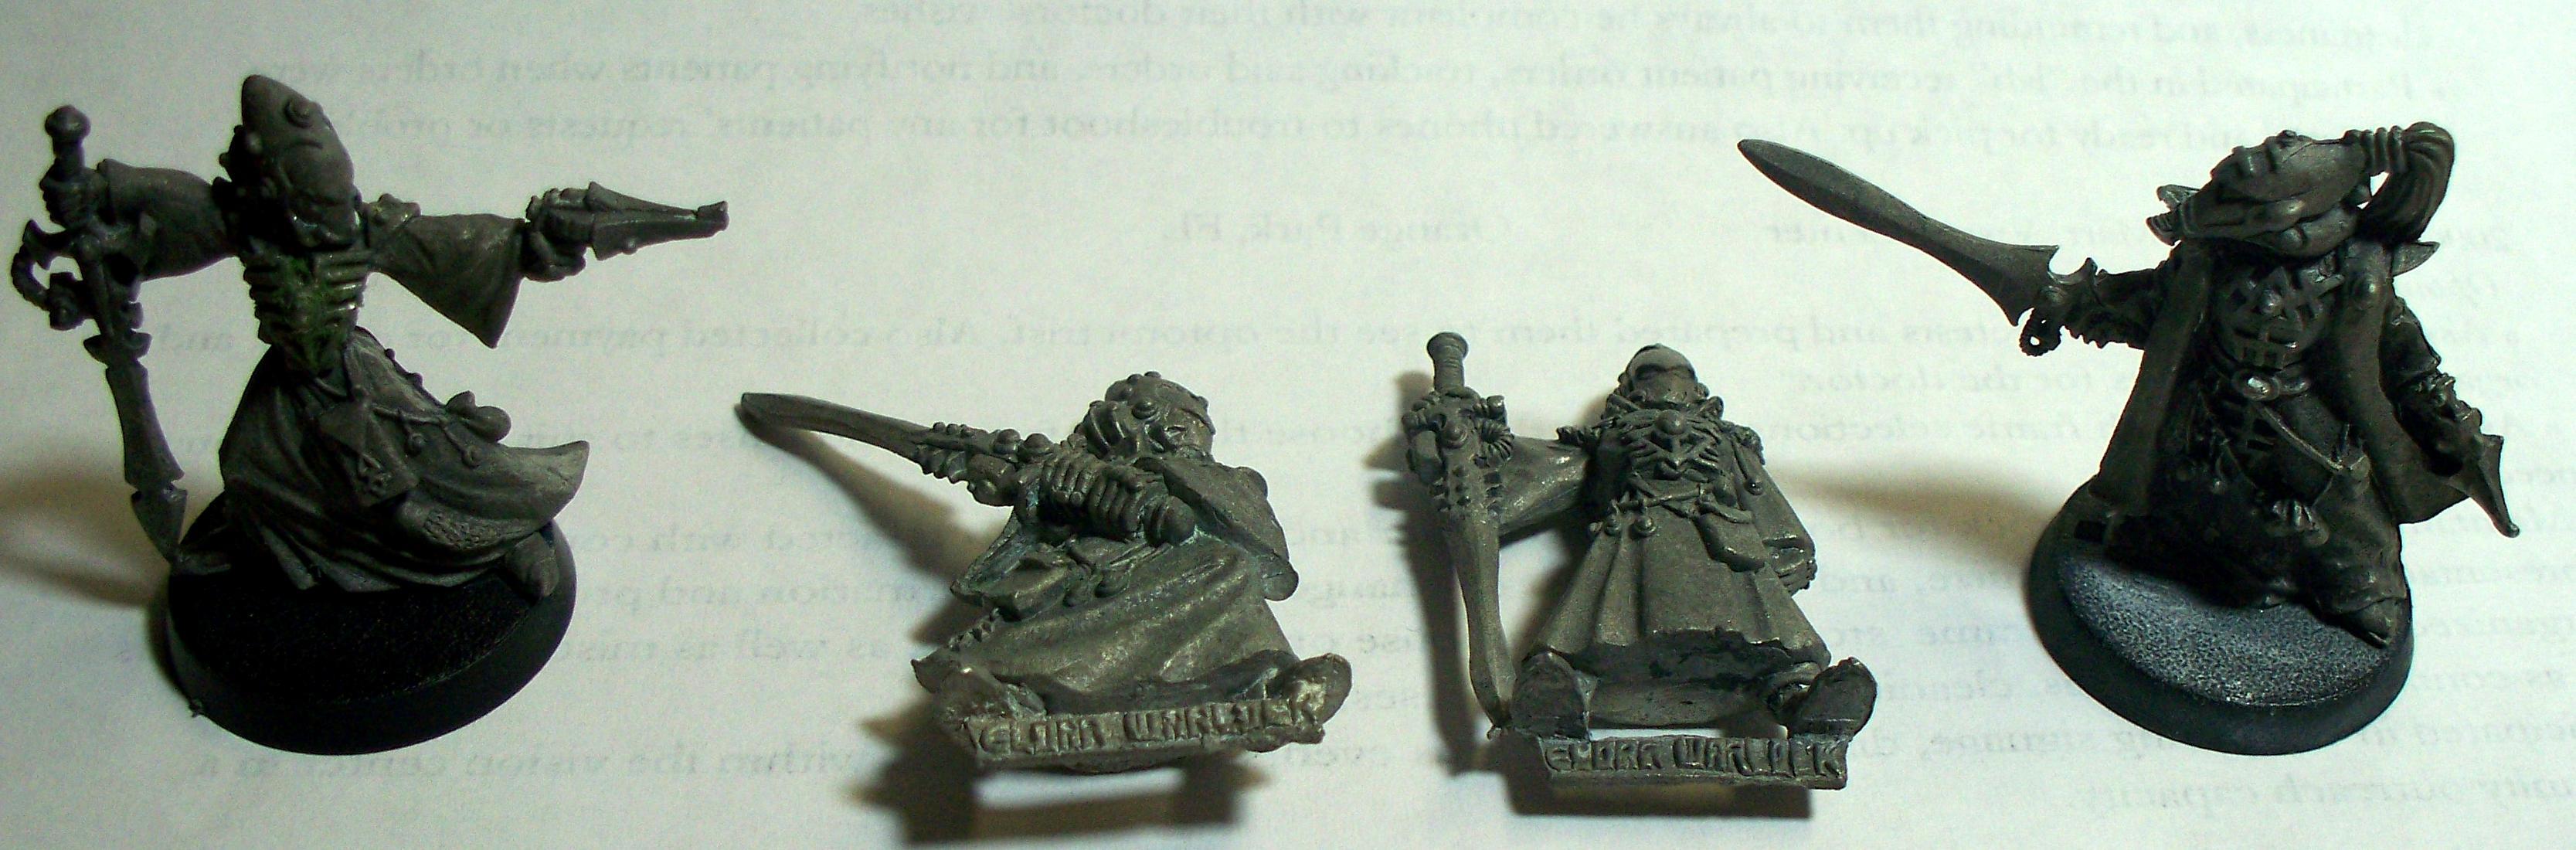 Eldar, Warhammer 40,000, Warlock